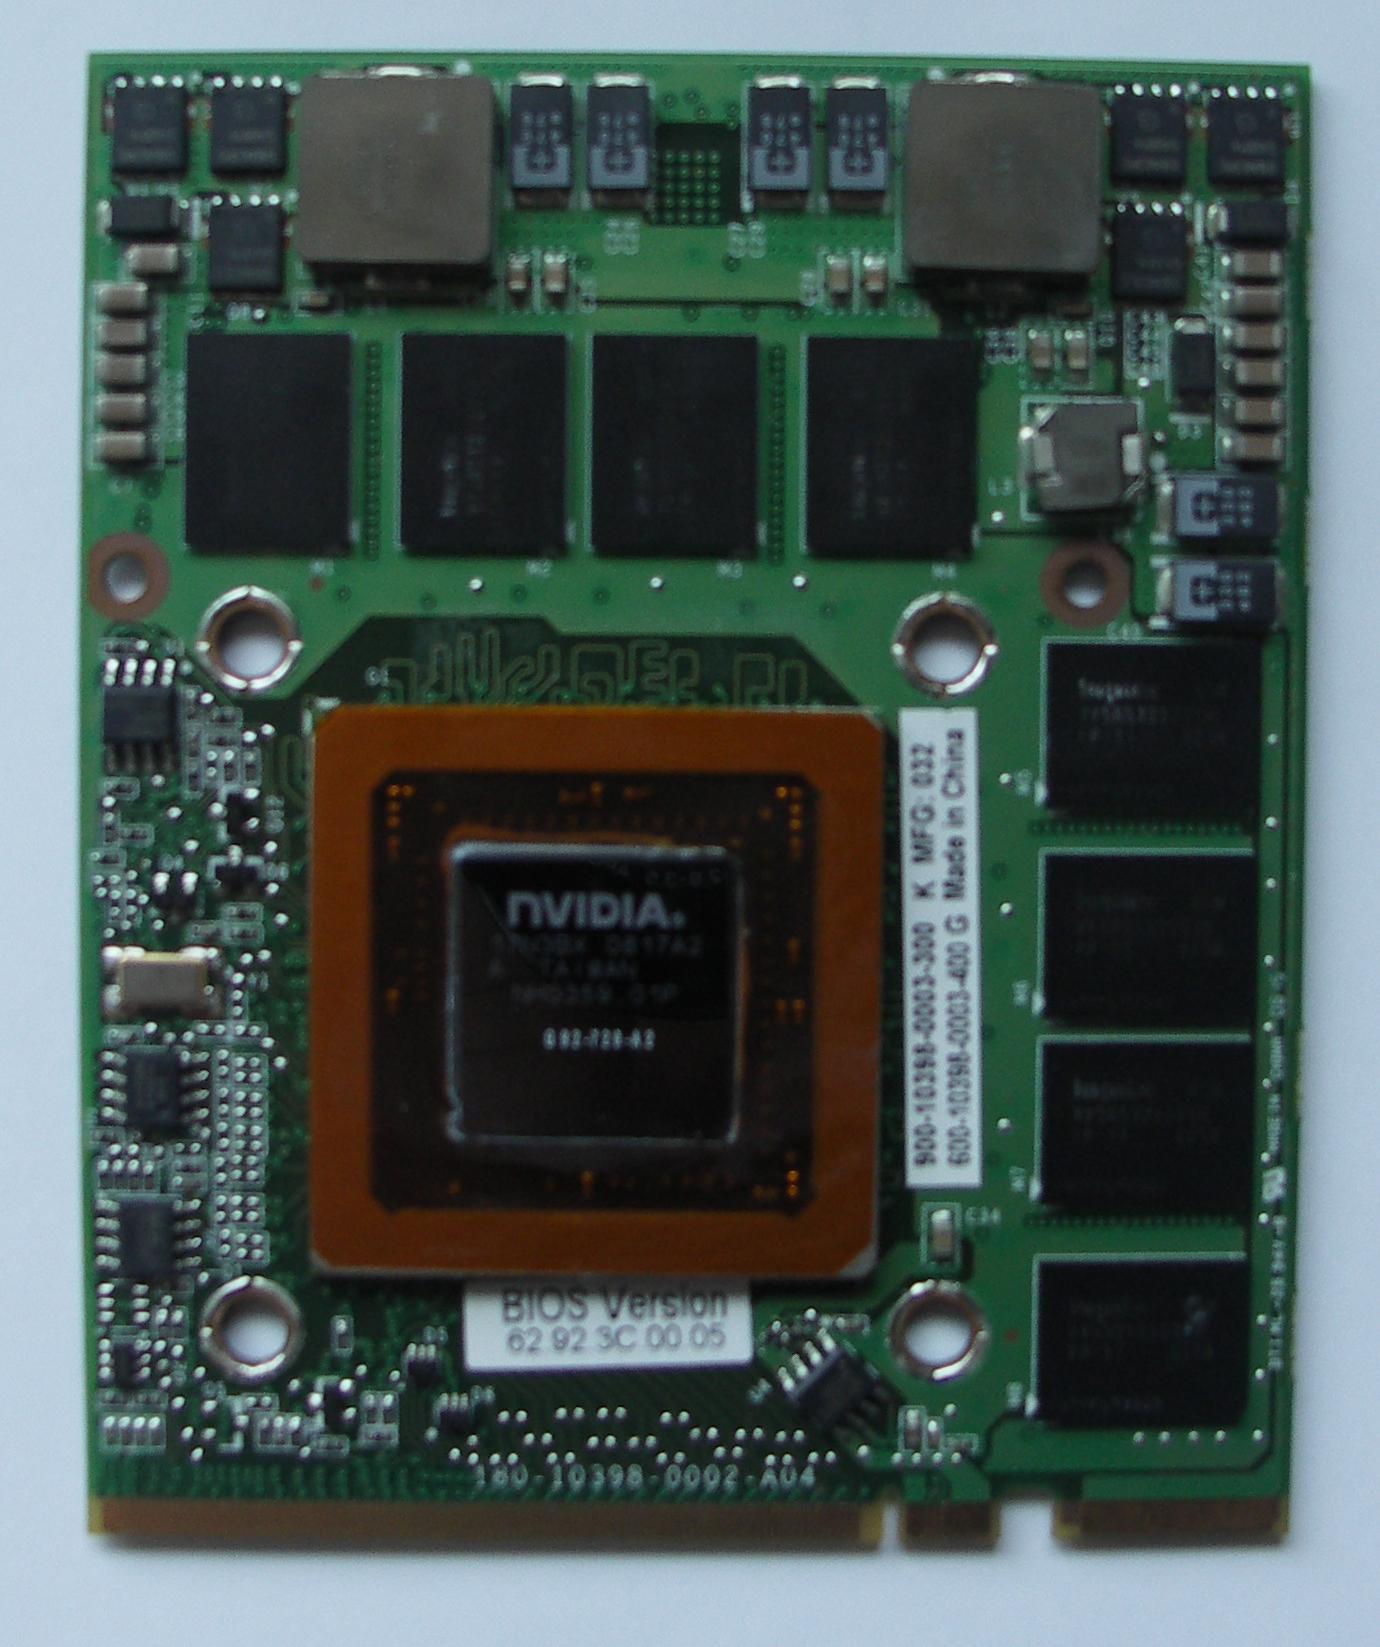 NVidia GeForce 9800M GT Drivers